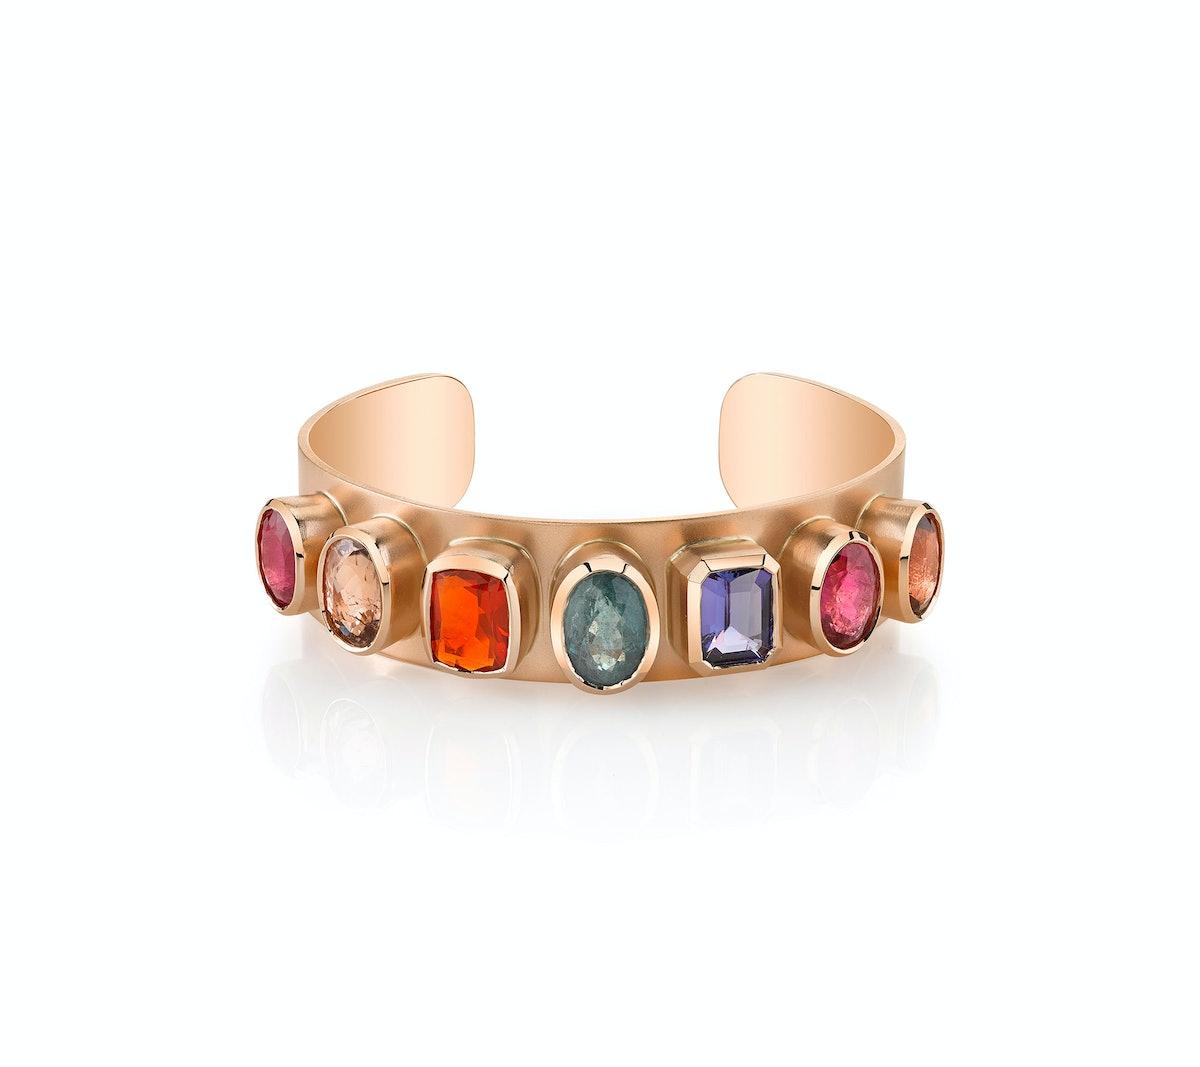 Irene Neuwirth 18k rose gold, tourmaline, tanzanite, and Mexican fire opal